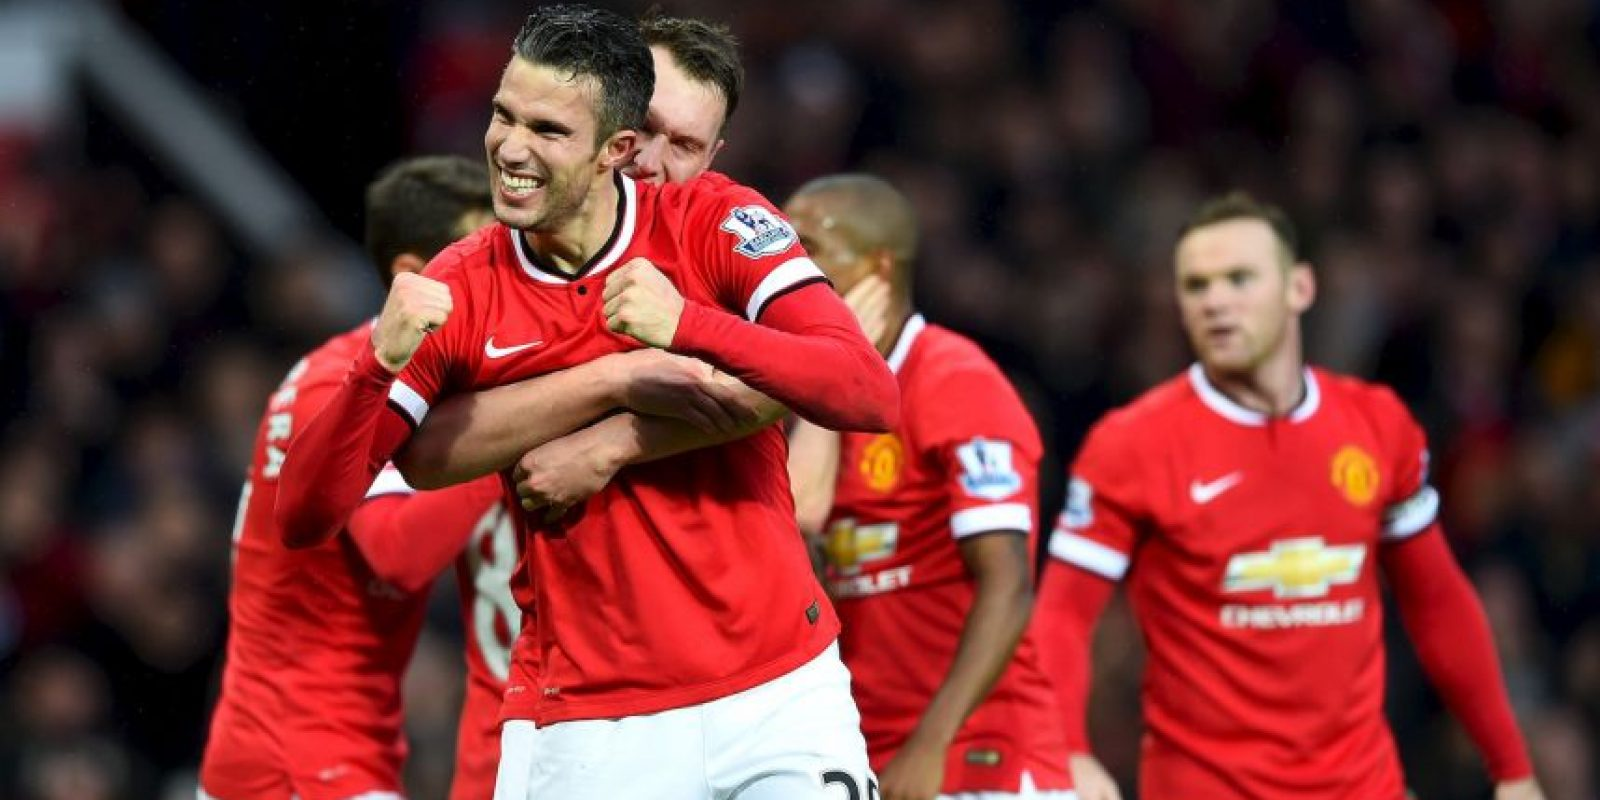 6. Familia Glazer – Manchester United Foto:Getty Images